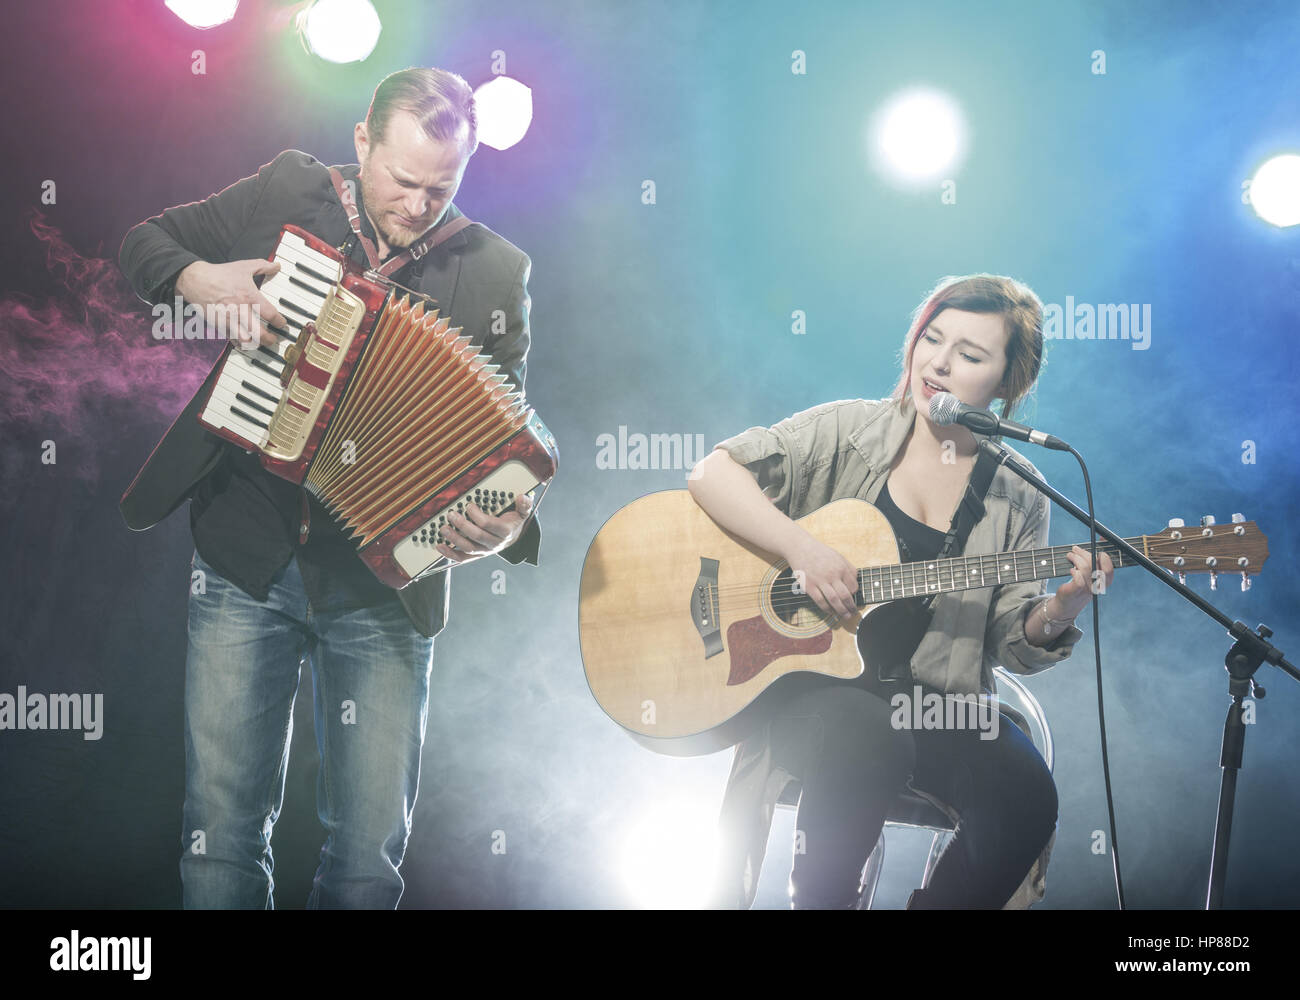 Musiker Mit Akkordeon, Musikerin Mit Gitarre (Model-Release) Stockbild